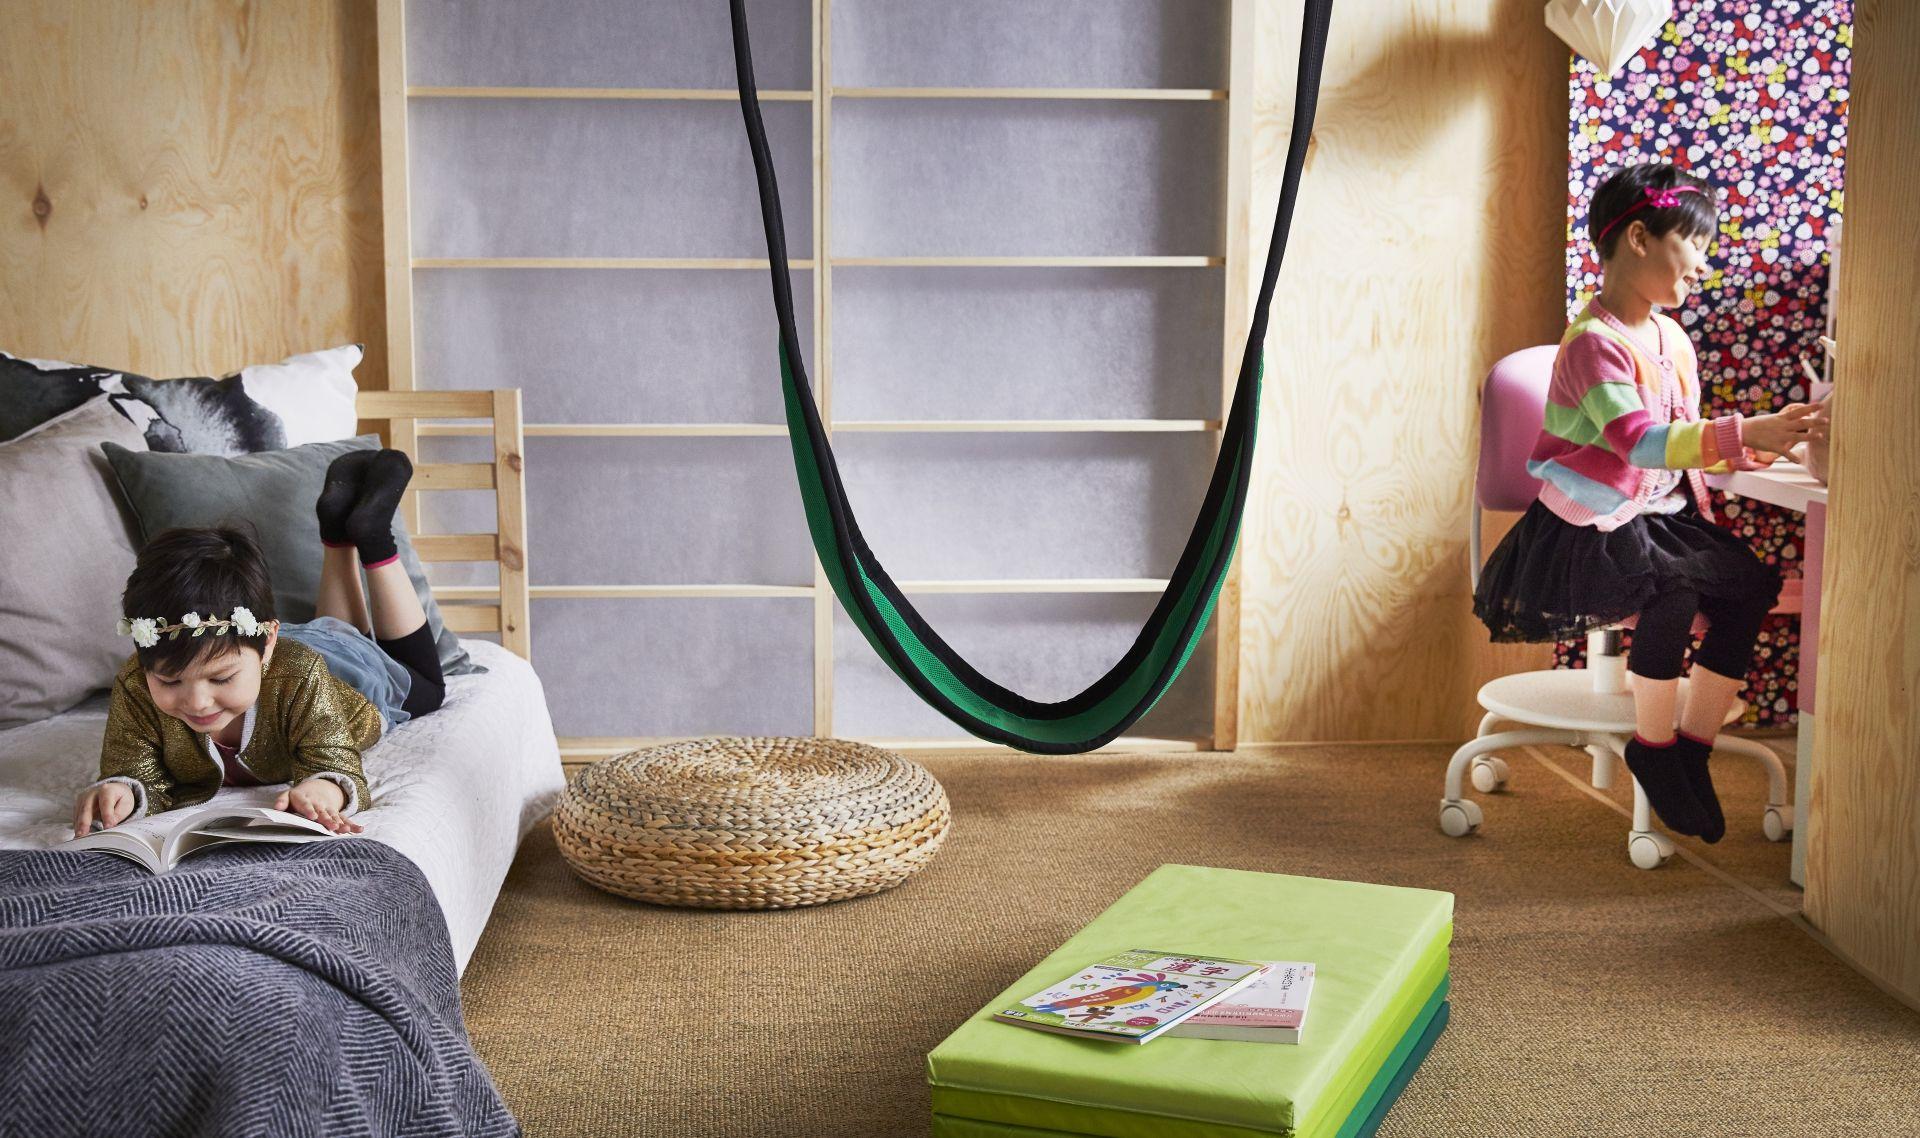 Kinder Bureaustoel Roze Ikea.Nederland Bso Tips Ikea Kinderkamer En Interieur